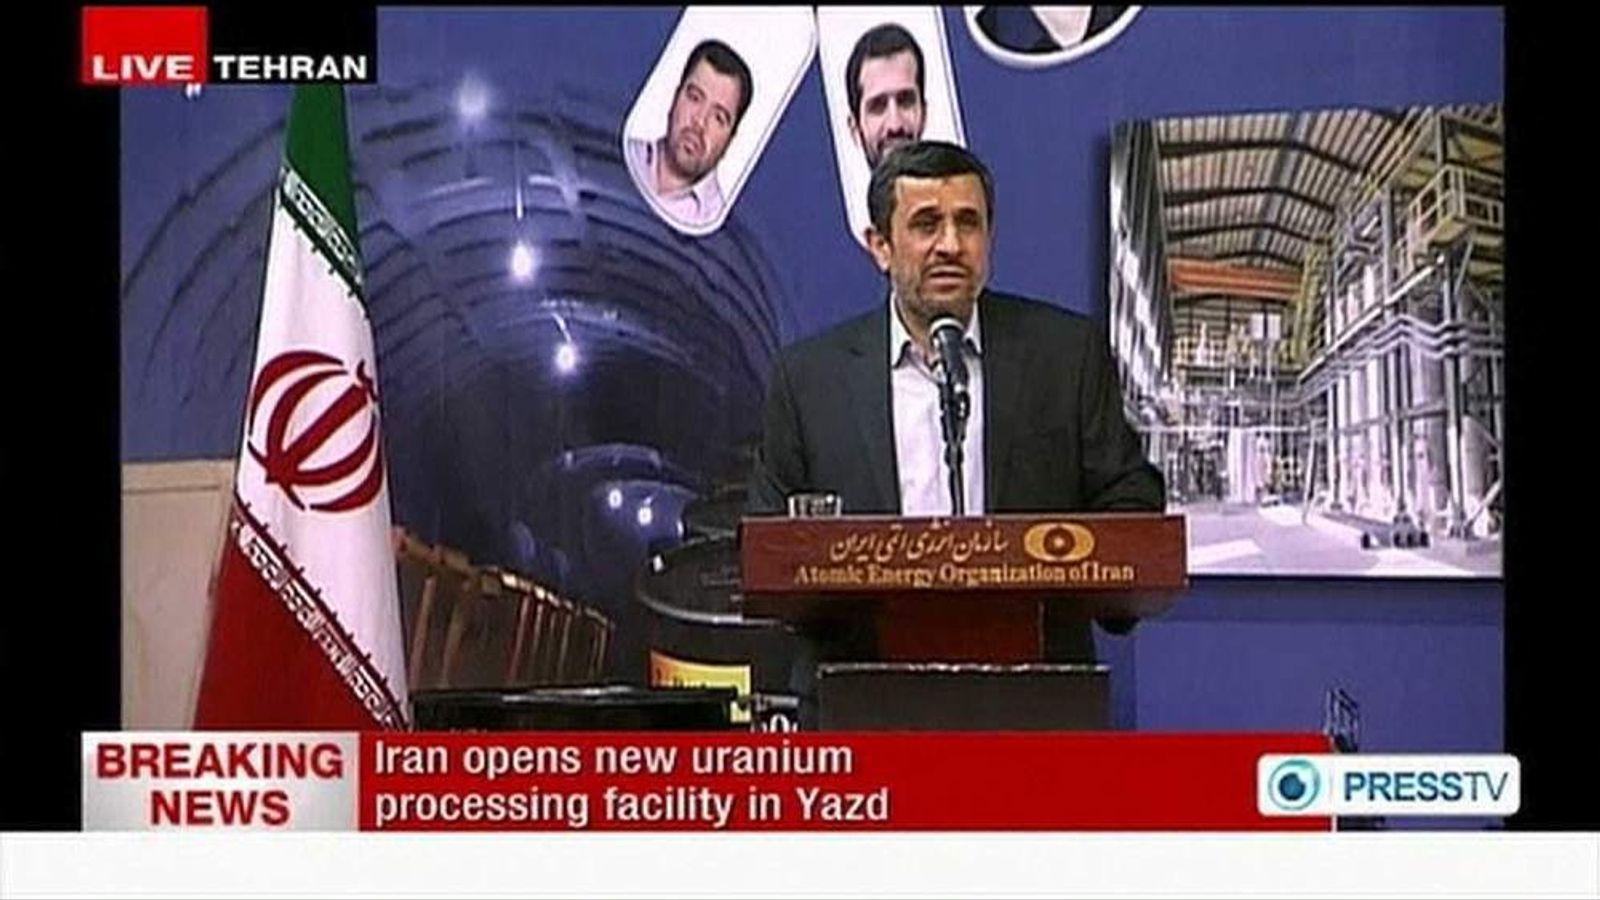 Iran opens nuclear production facility at Ardakan